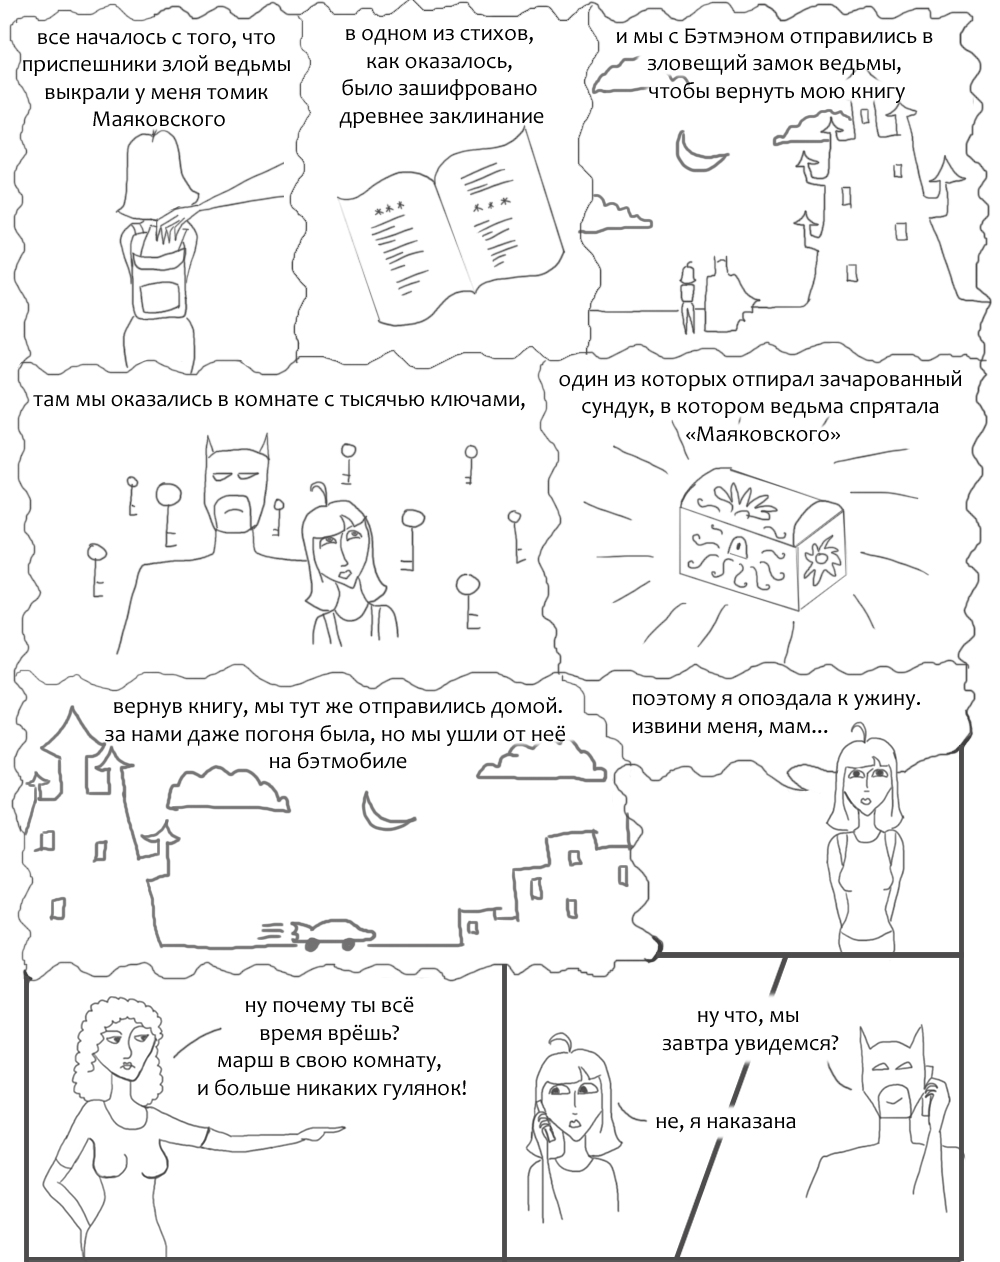 Комикс битва №16 выпуск 158